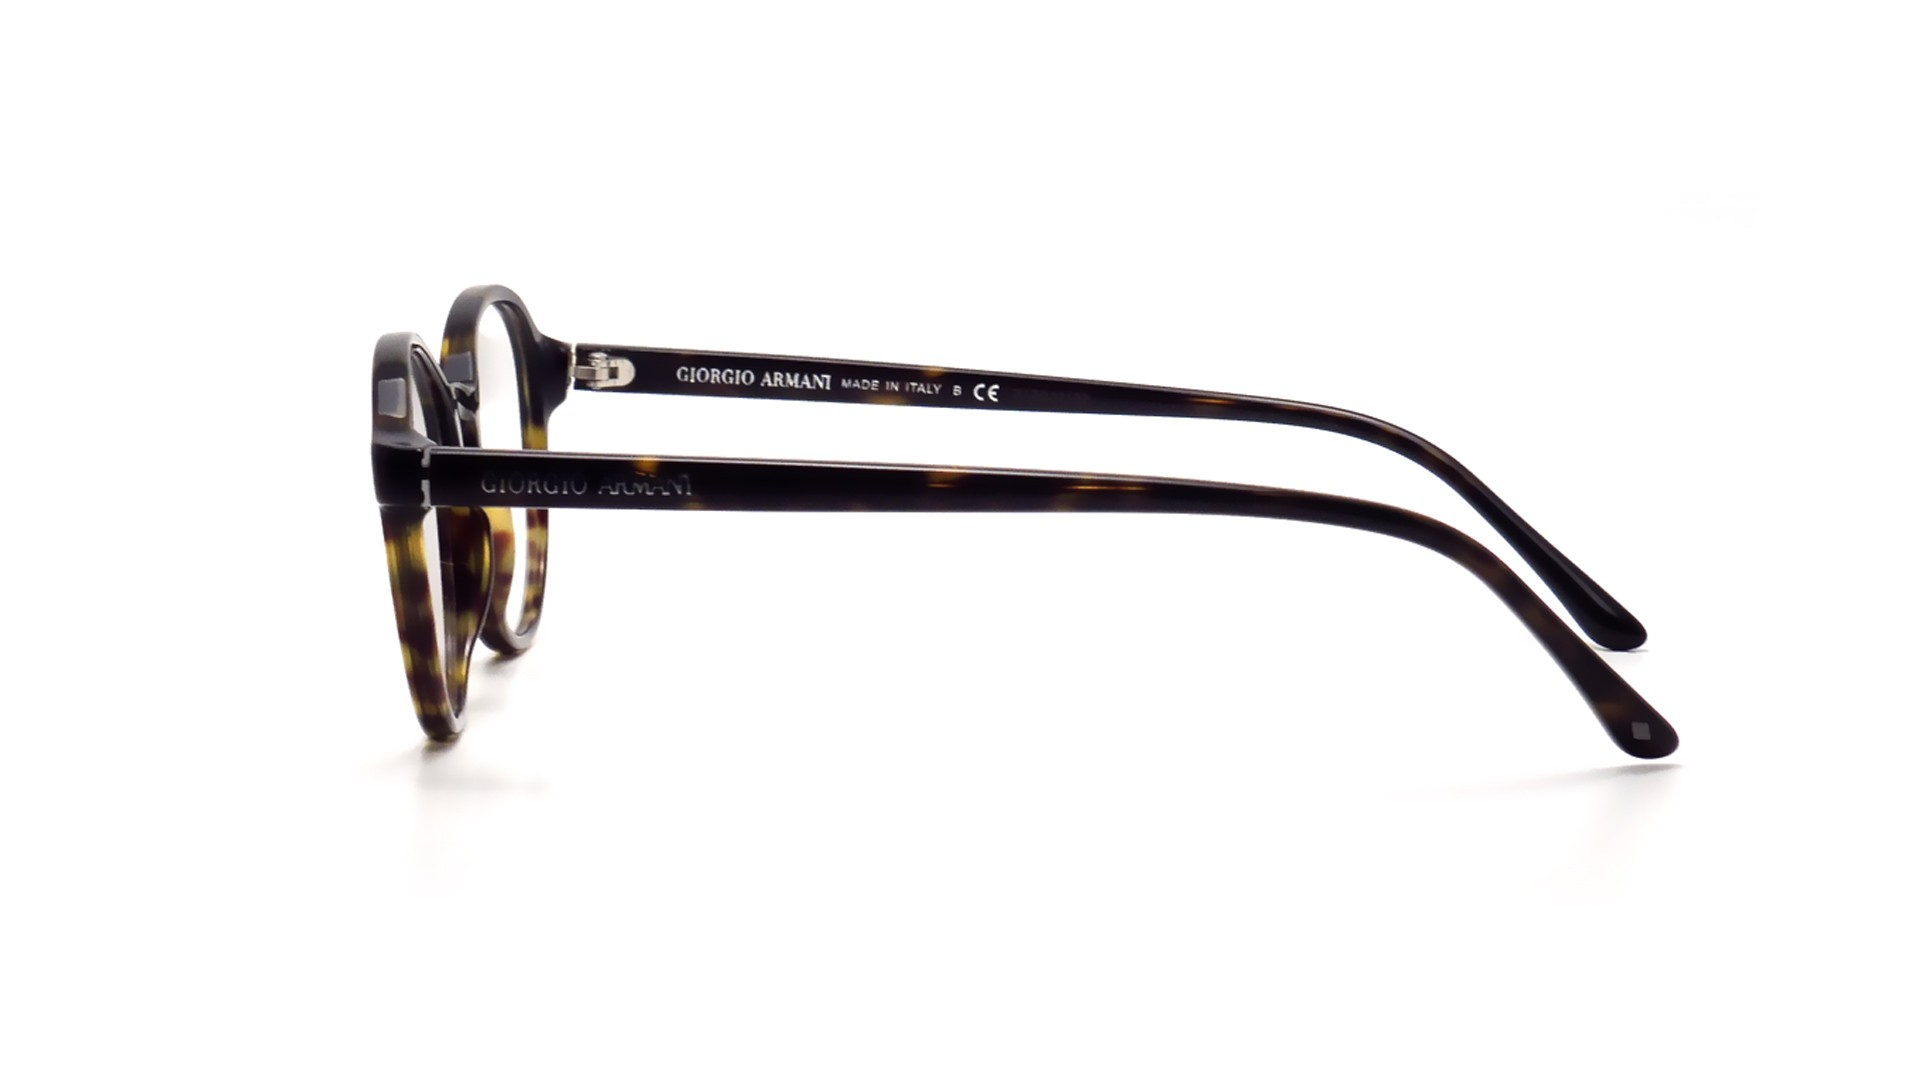 859acc2f54 Giorgio Armani Frames of Life Tortoise AR7004 5026 49-19